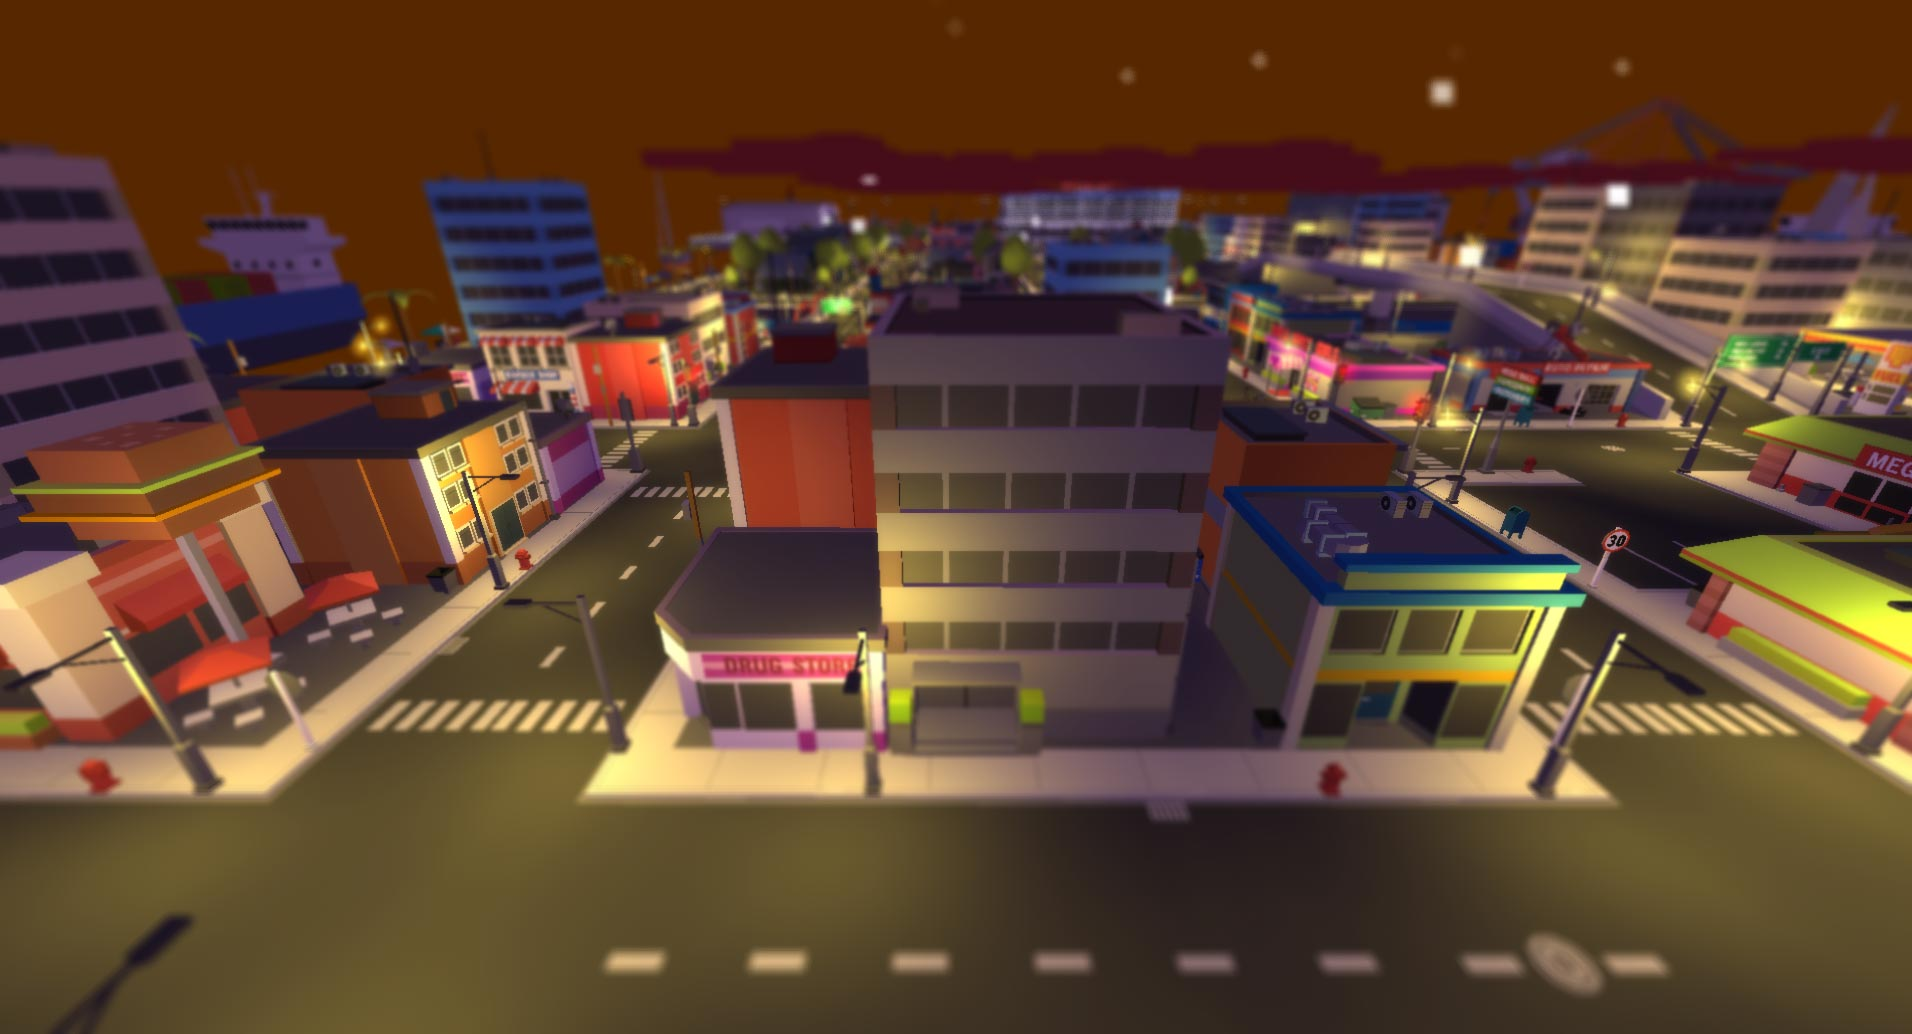 Low-poly City